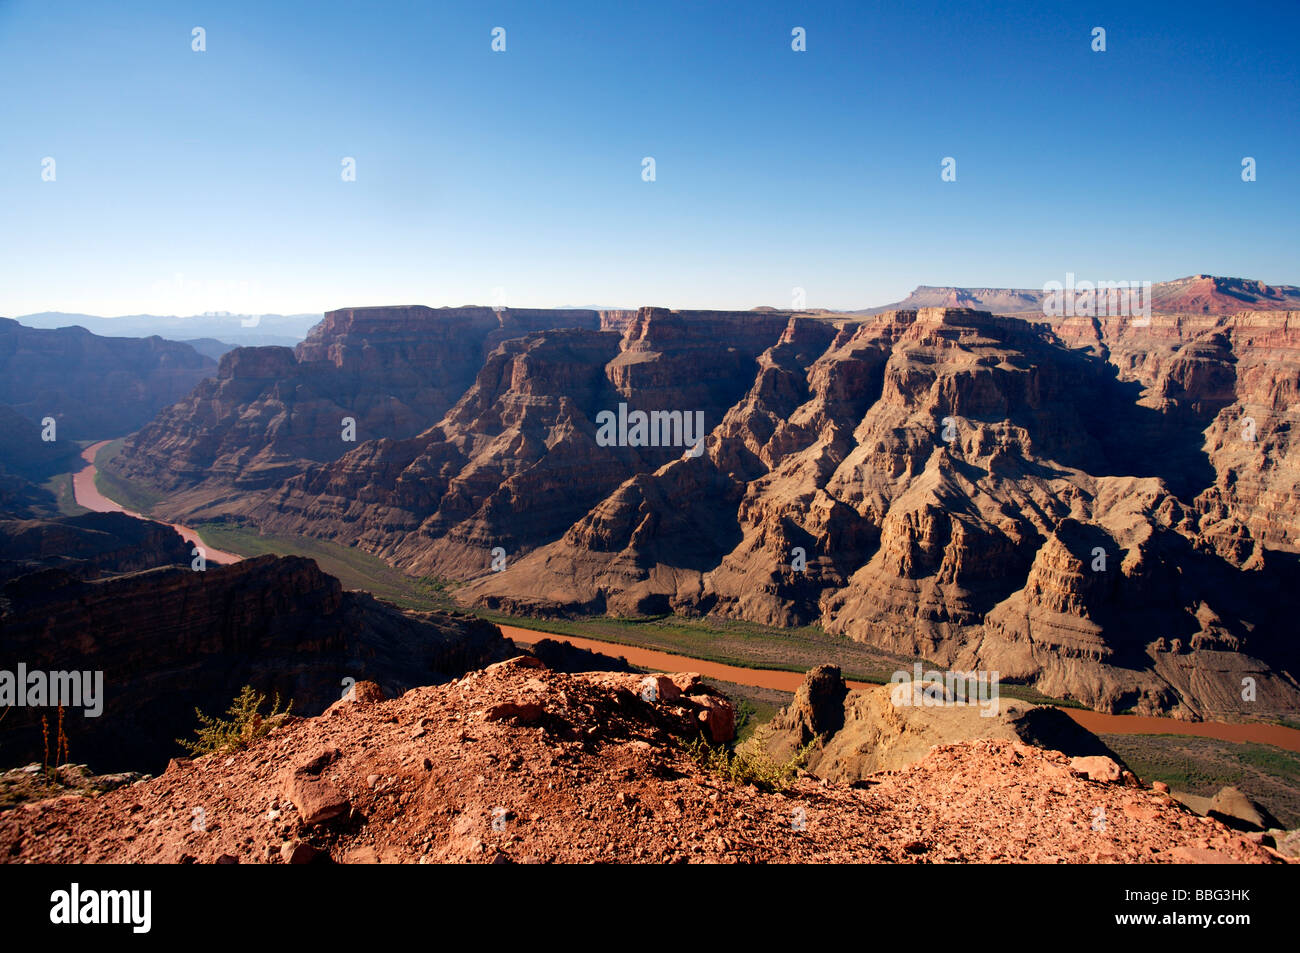 West Rim Grand Canyon Colorado River Arizona - Stock Image